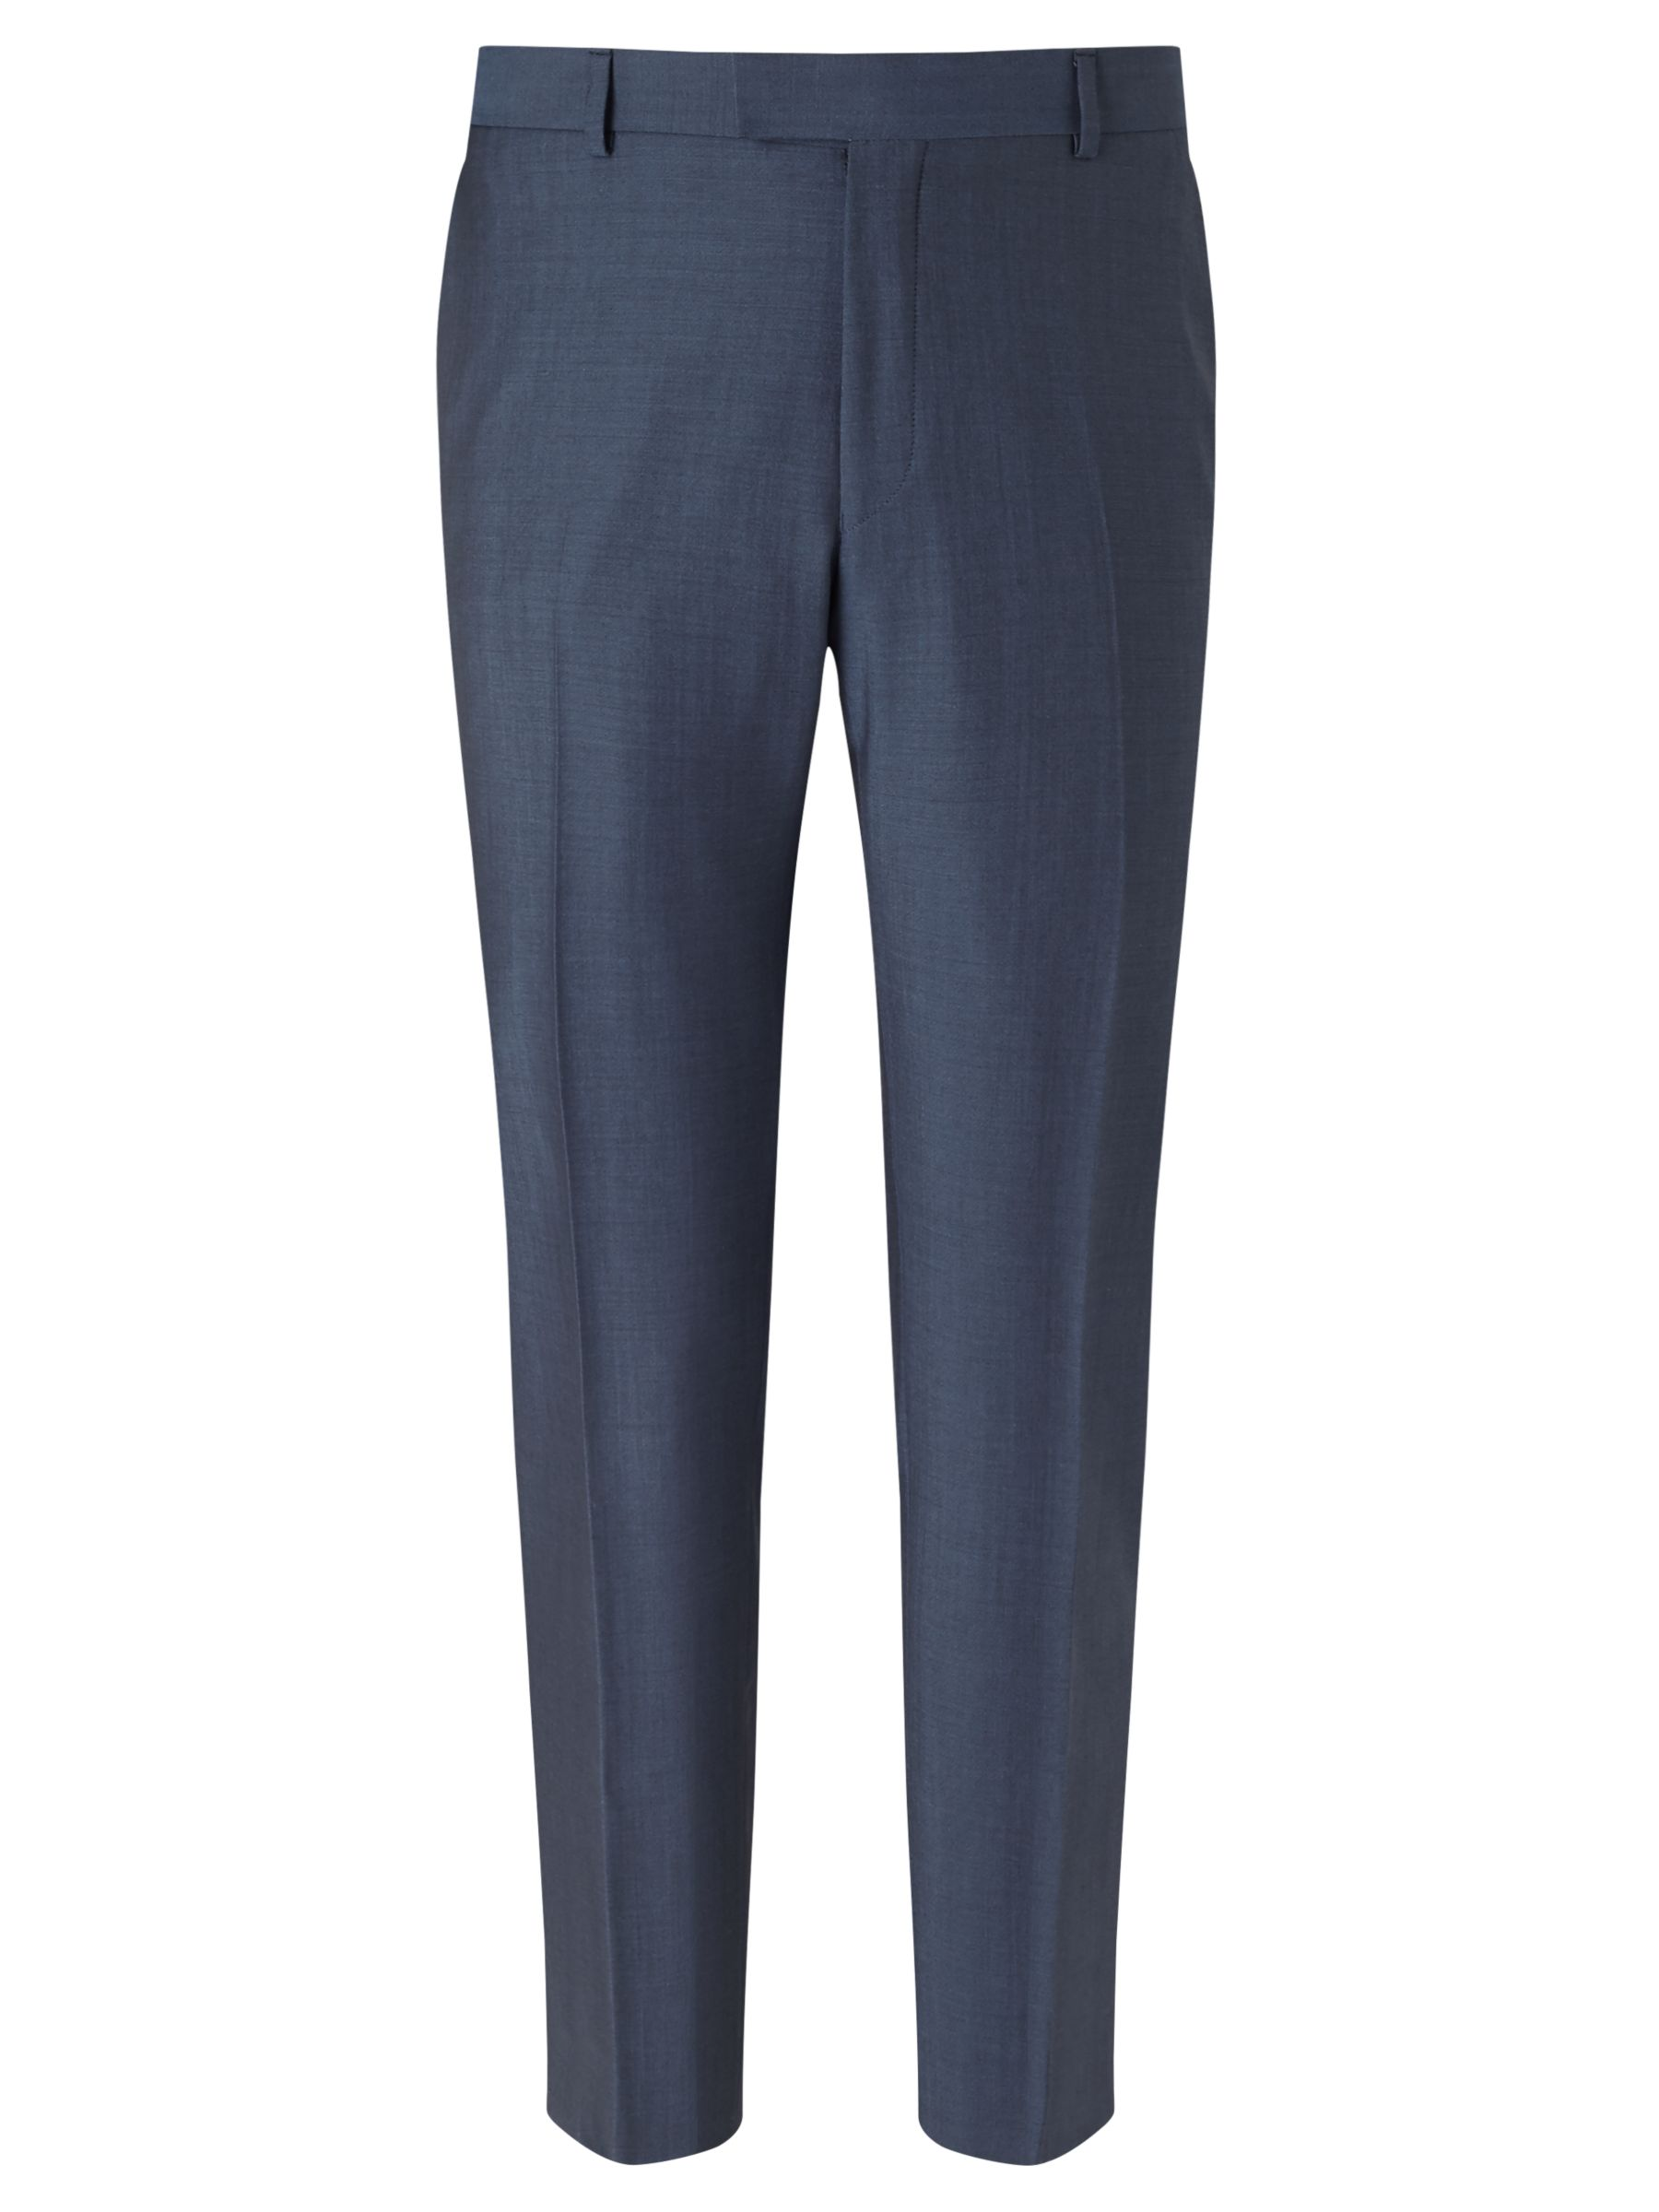 Richard James Mayfair Richard James Mayfair Wool Mohair Slim Fit Suit Trousers, Blue Steel